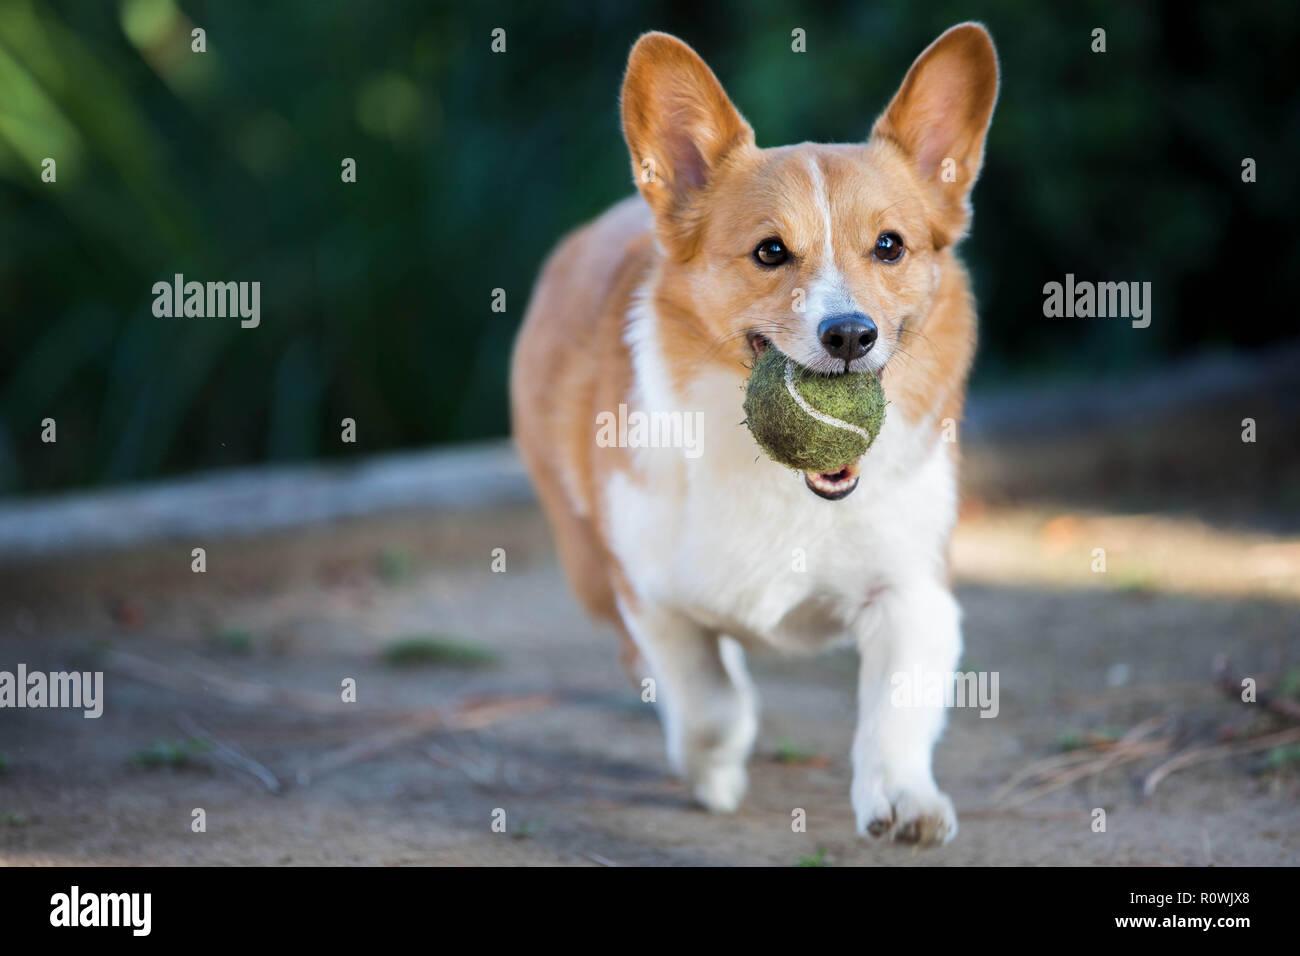 Pembroke Welsh Corgi Playing With Tennis Ball - Stock Image